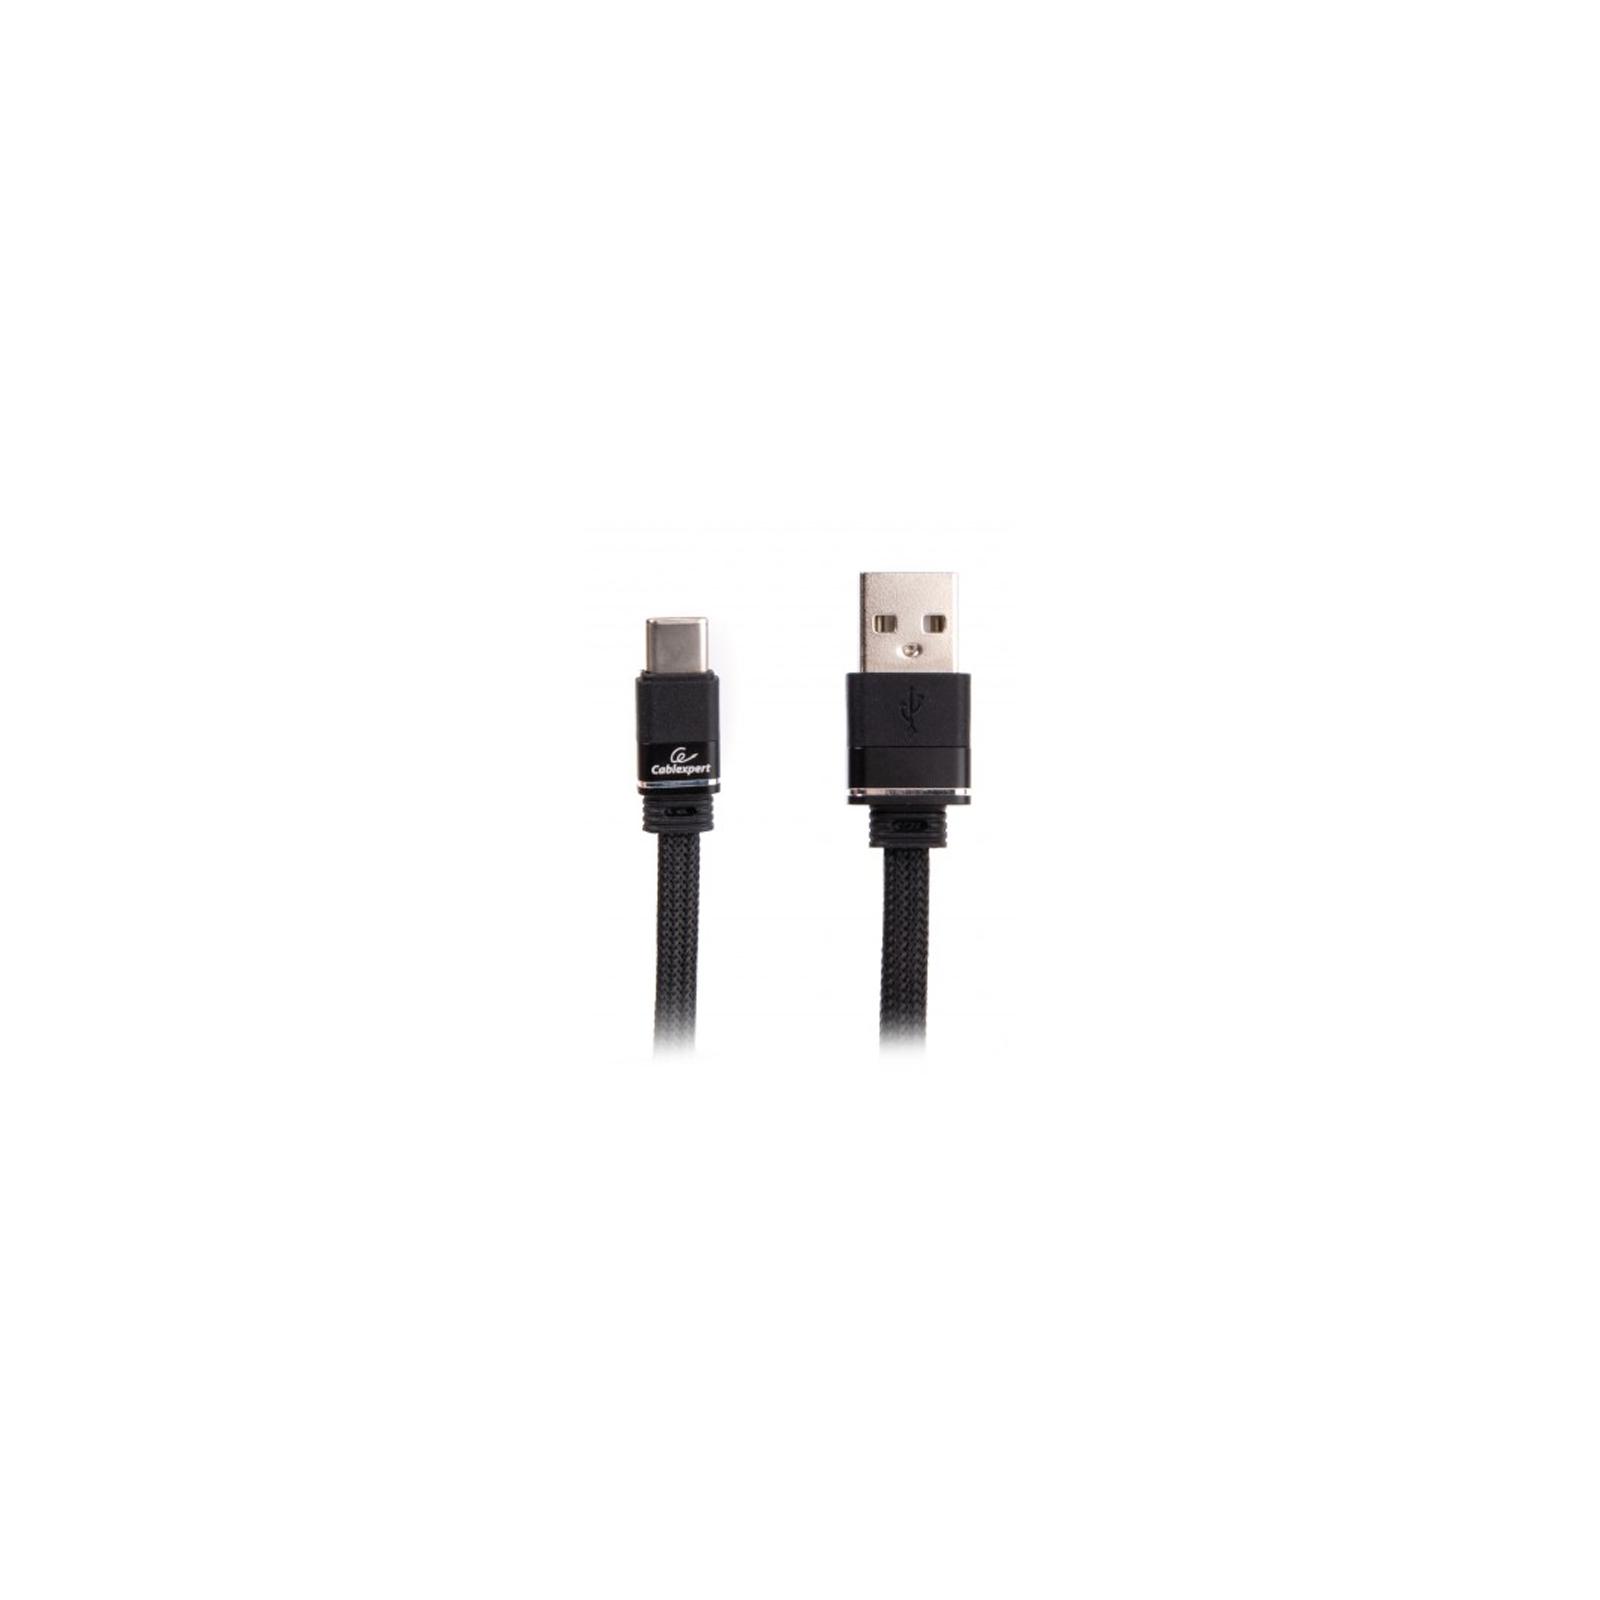 Дата кабель USB 2.0 AM to Type-C 1.0m flat Cablexpert (CCPB-C-USB-10BK)